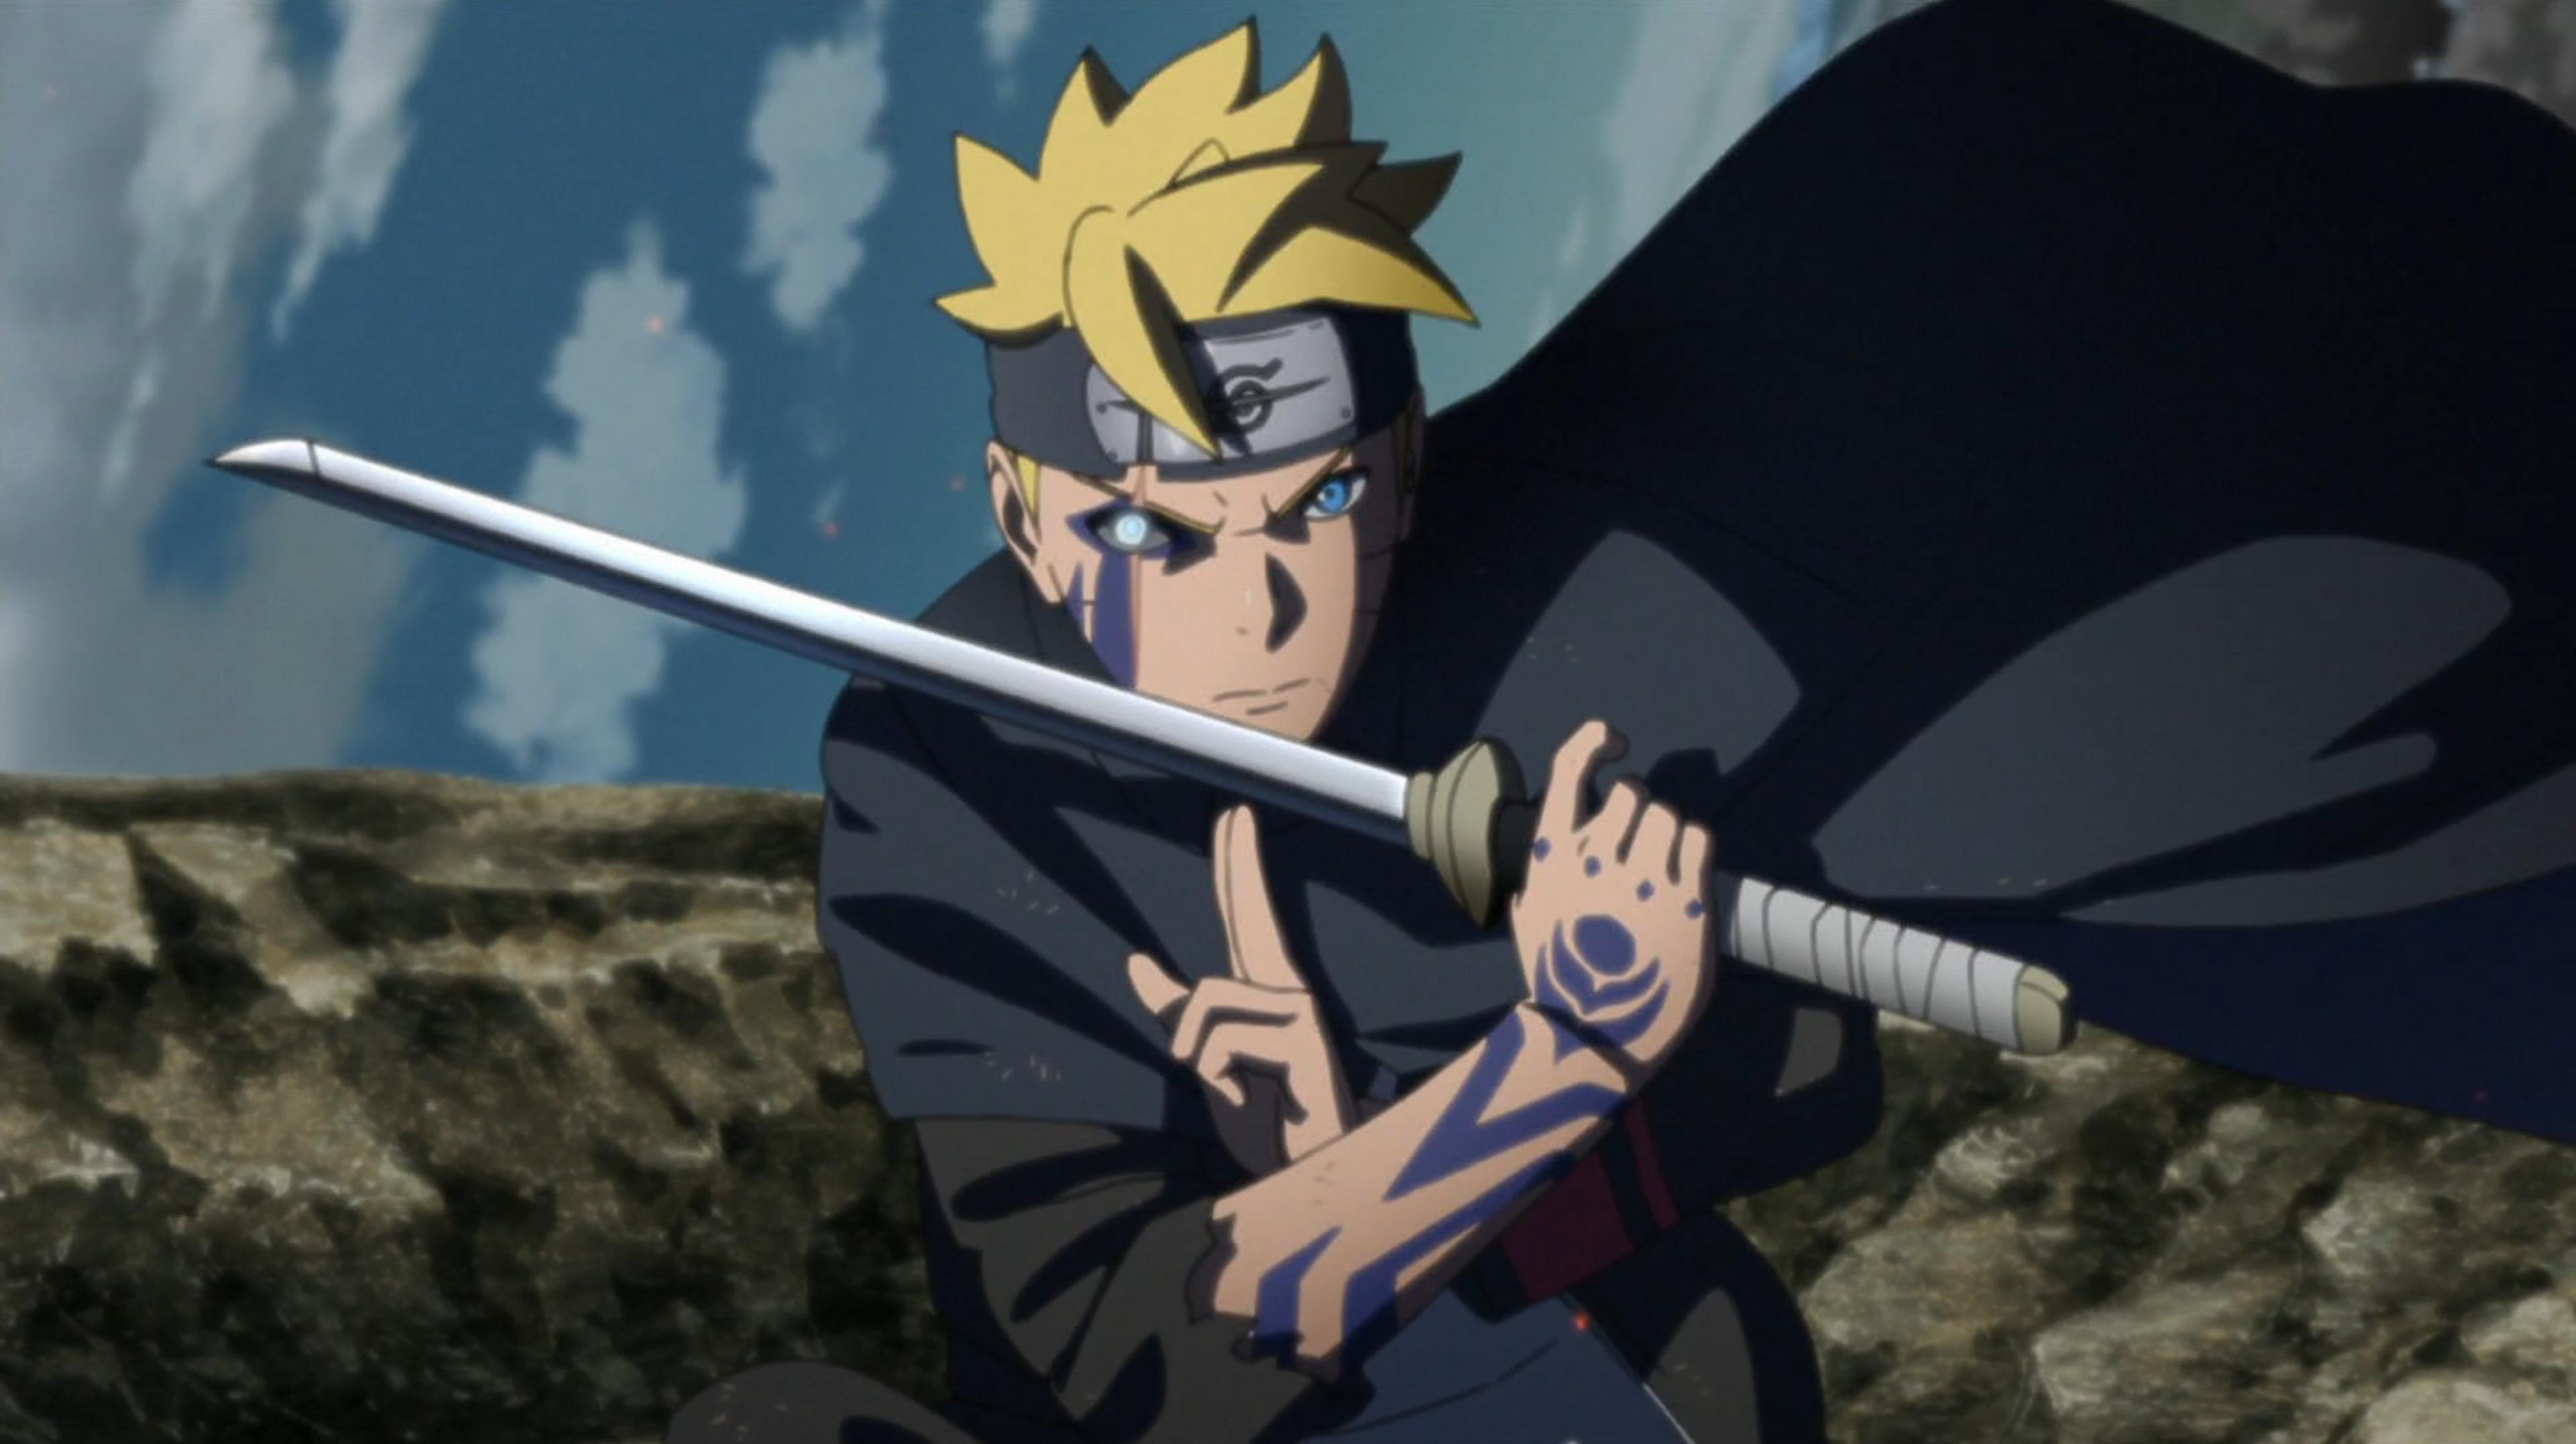 5 Teori Anime Boruto yang Luar Biasa dari Penggemar - KINCIR.com